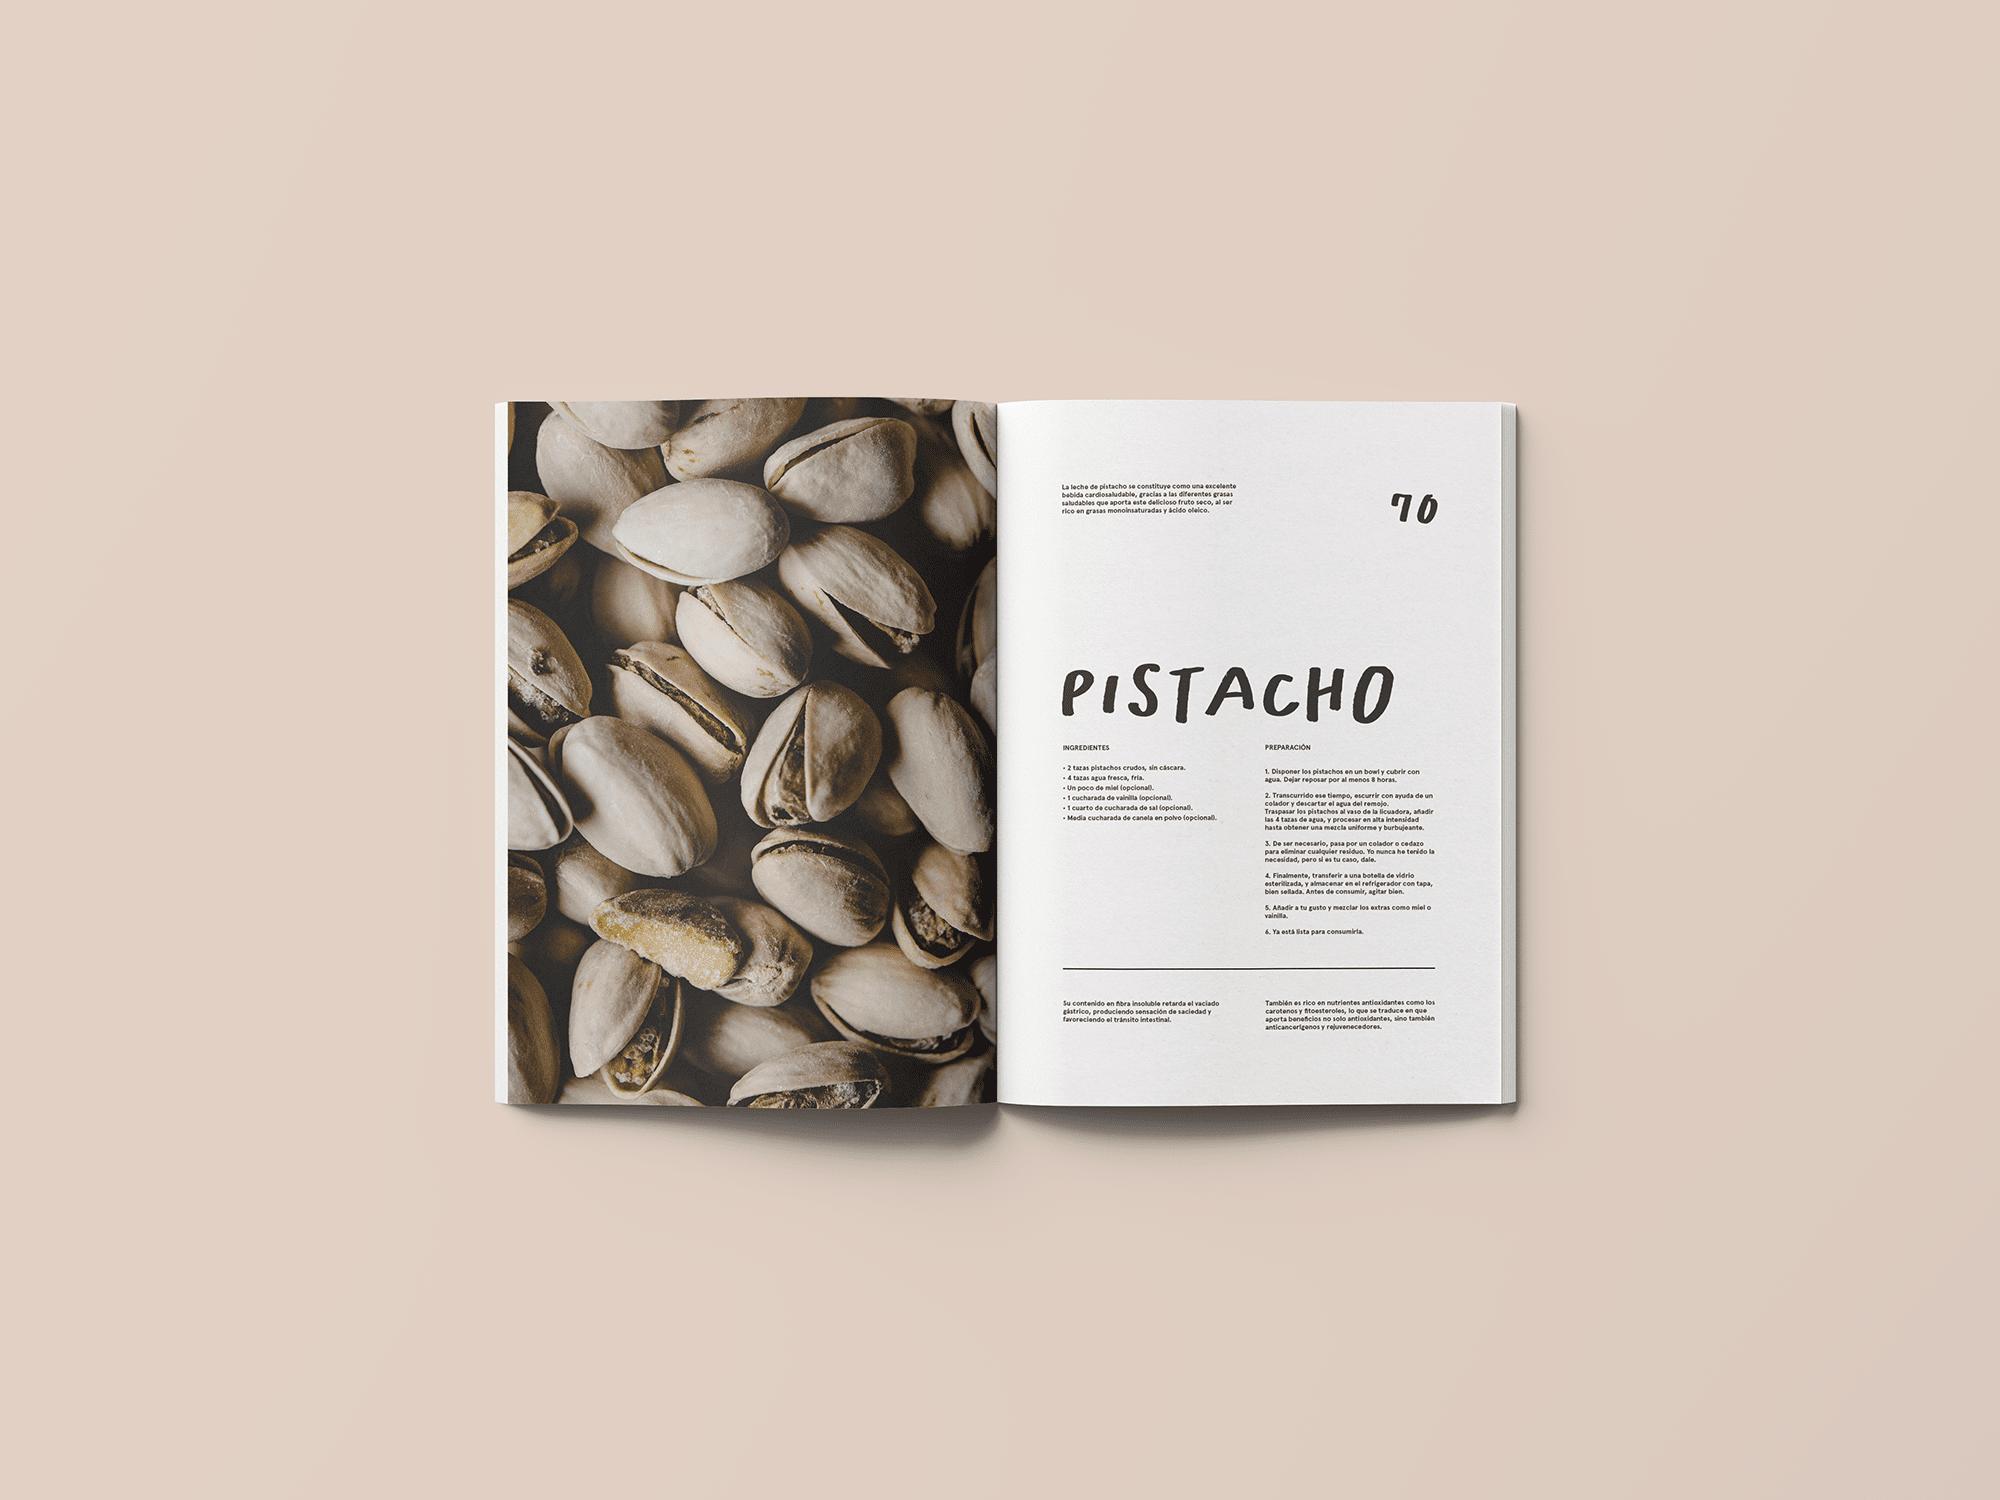 spread-pistacho-book-lechadas-yoenpaperland